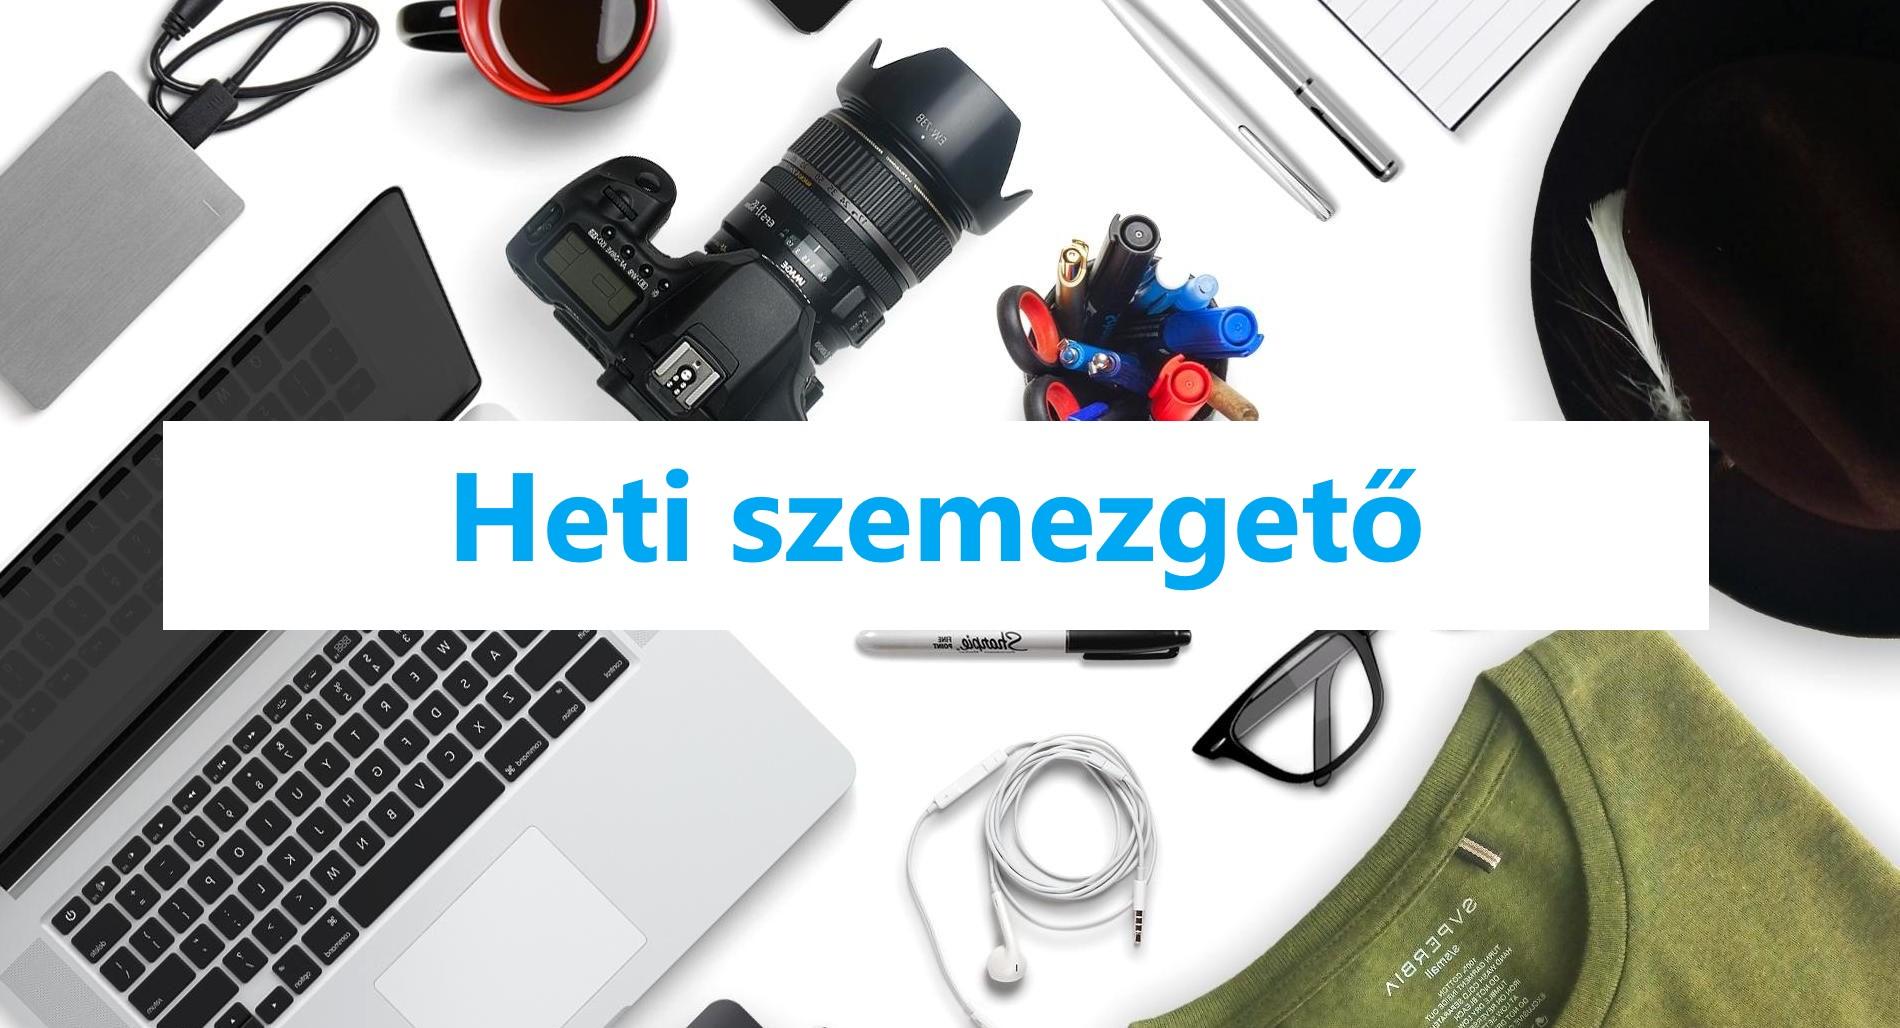 heti_szemezgeto_uj_31.jpg